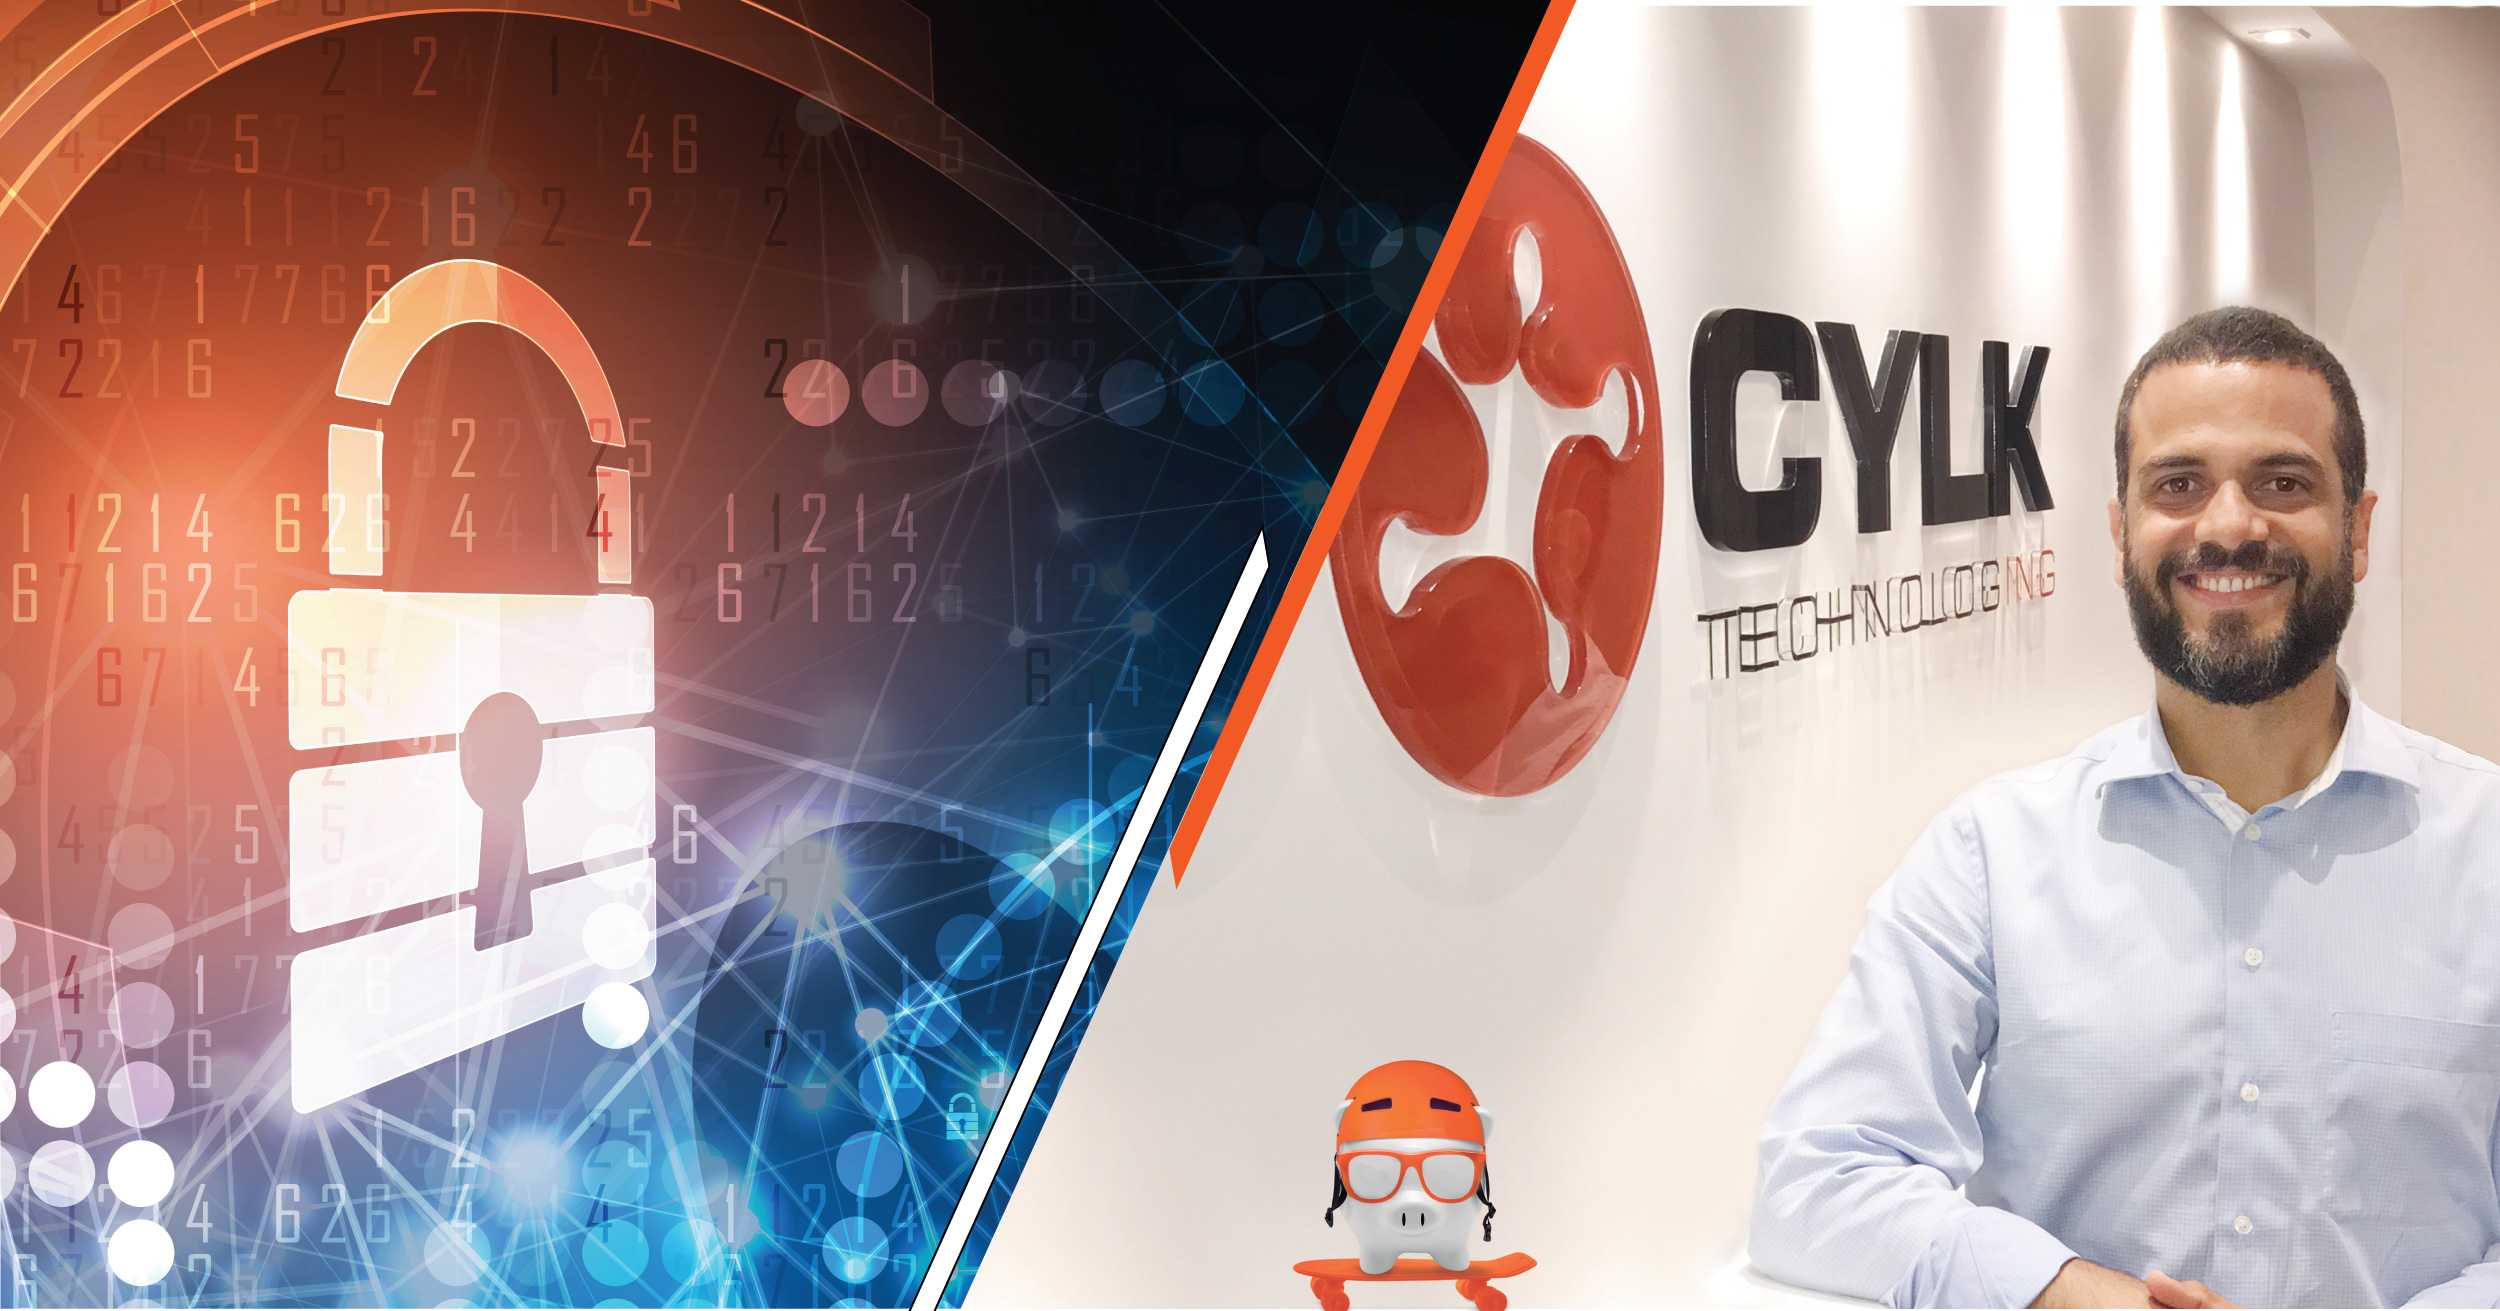 CYLK Technologing verticaliza unidade de cibersegurança